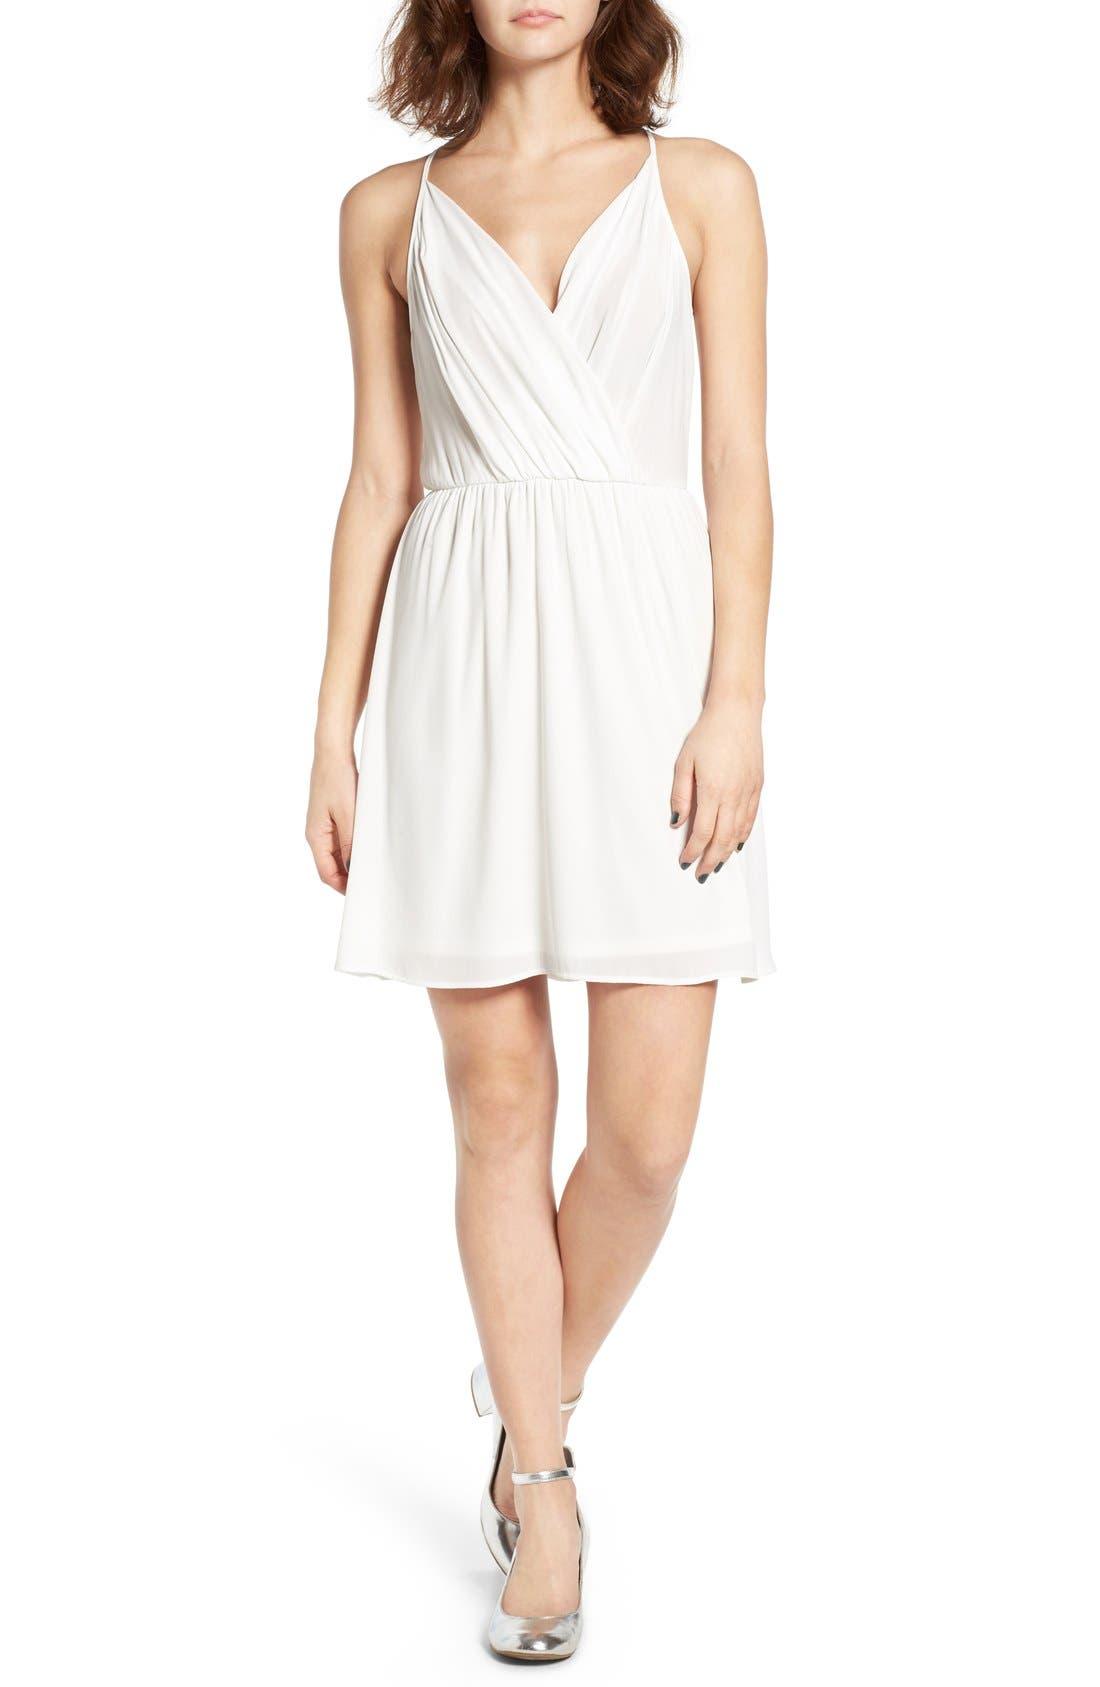 Alternate Image 1 Selected - Lush Surplice Camisole Dress